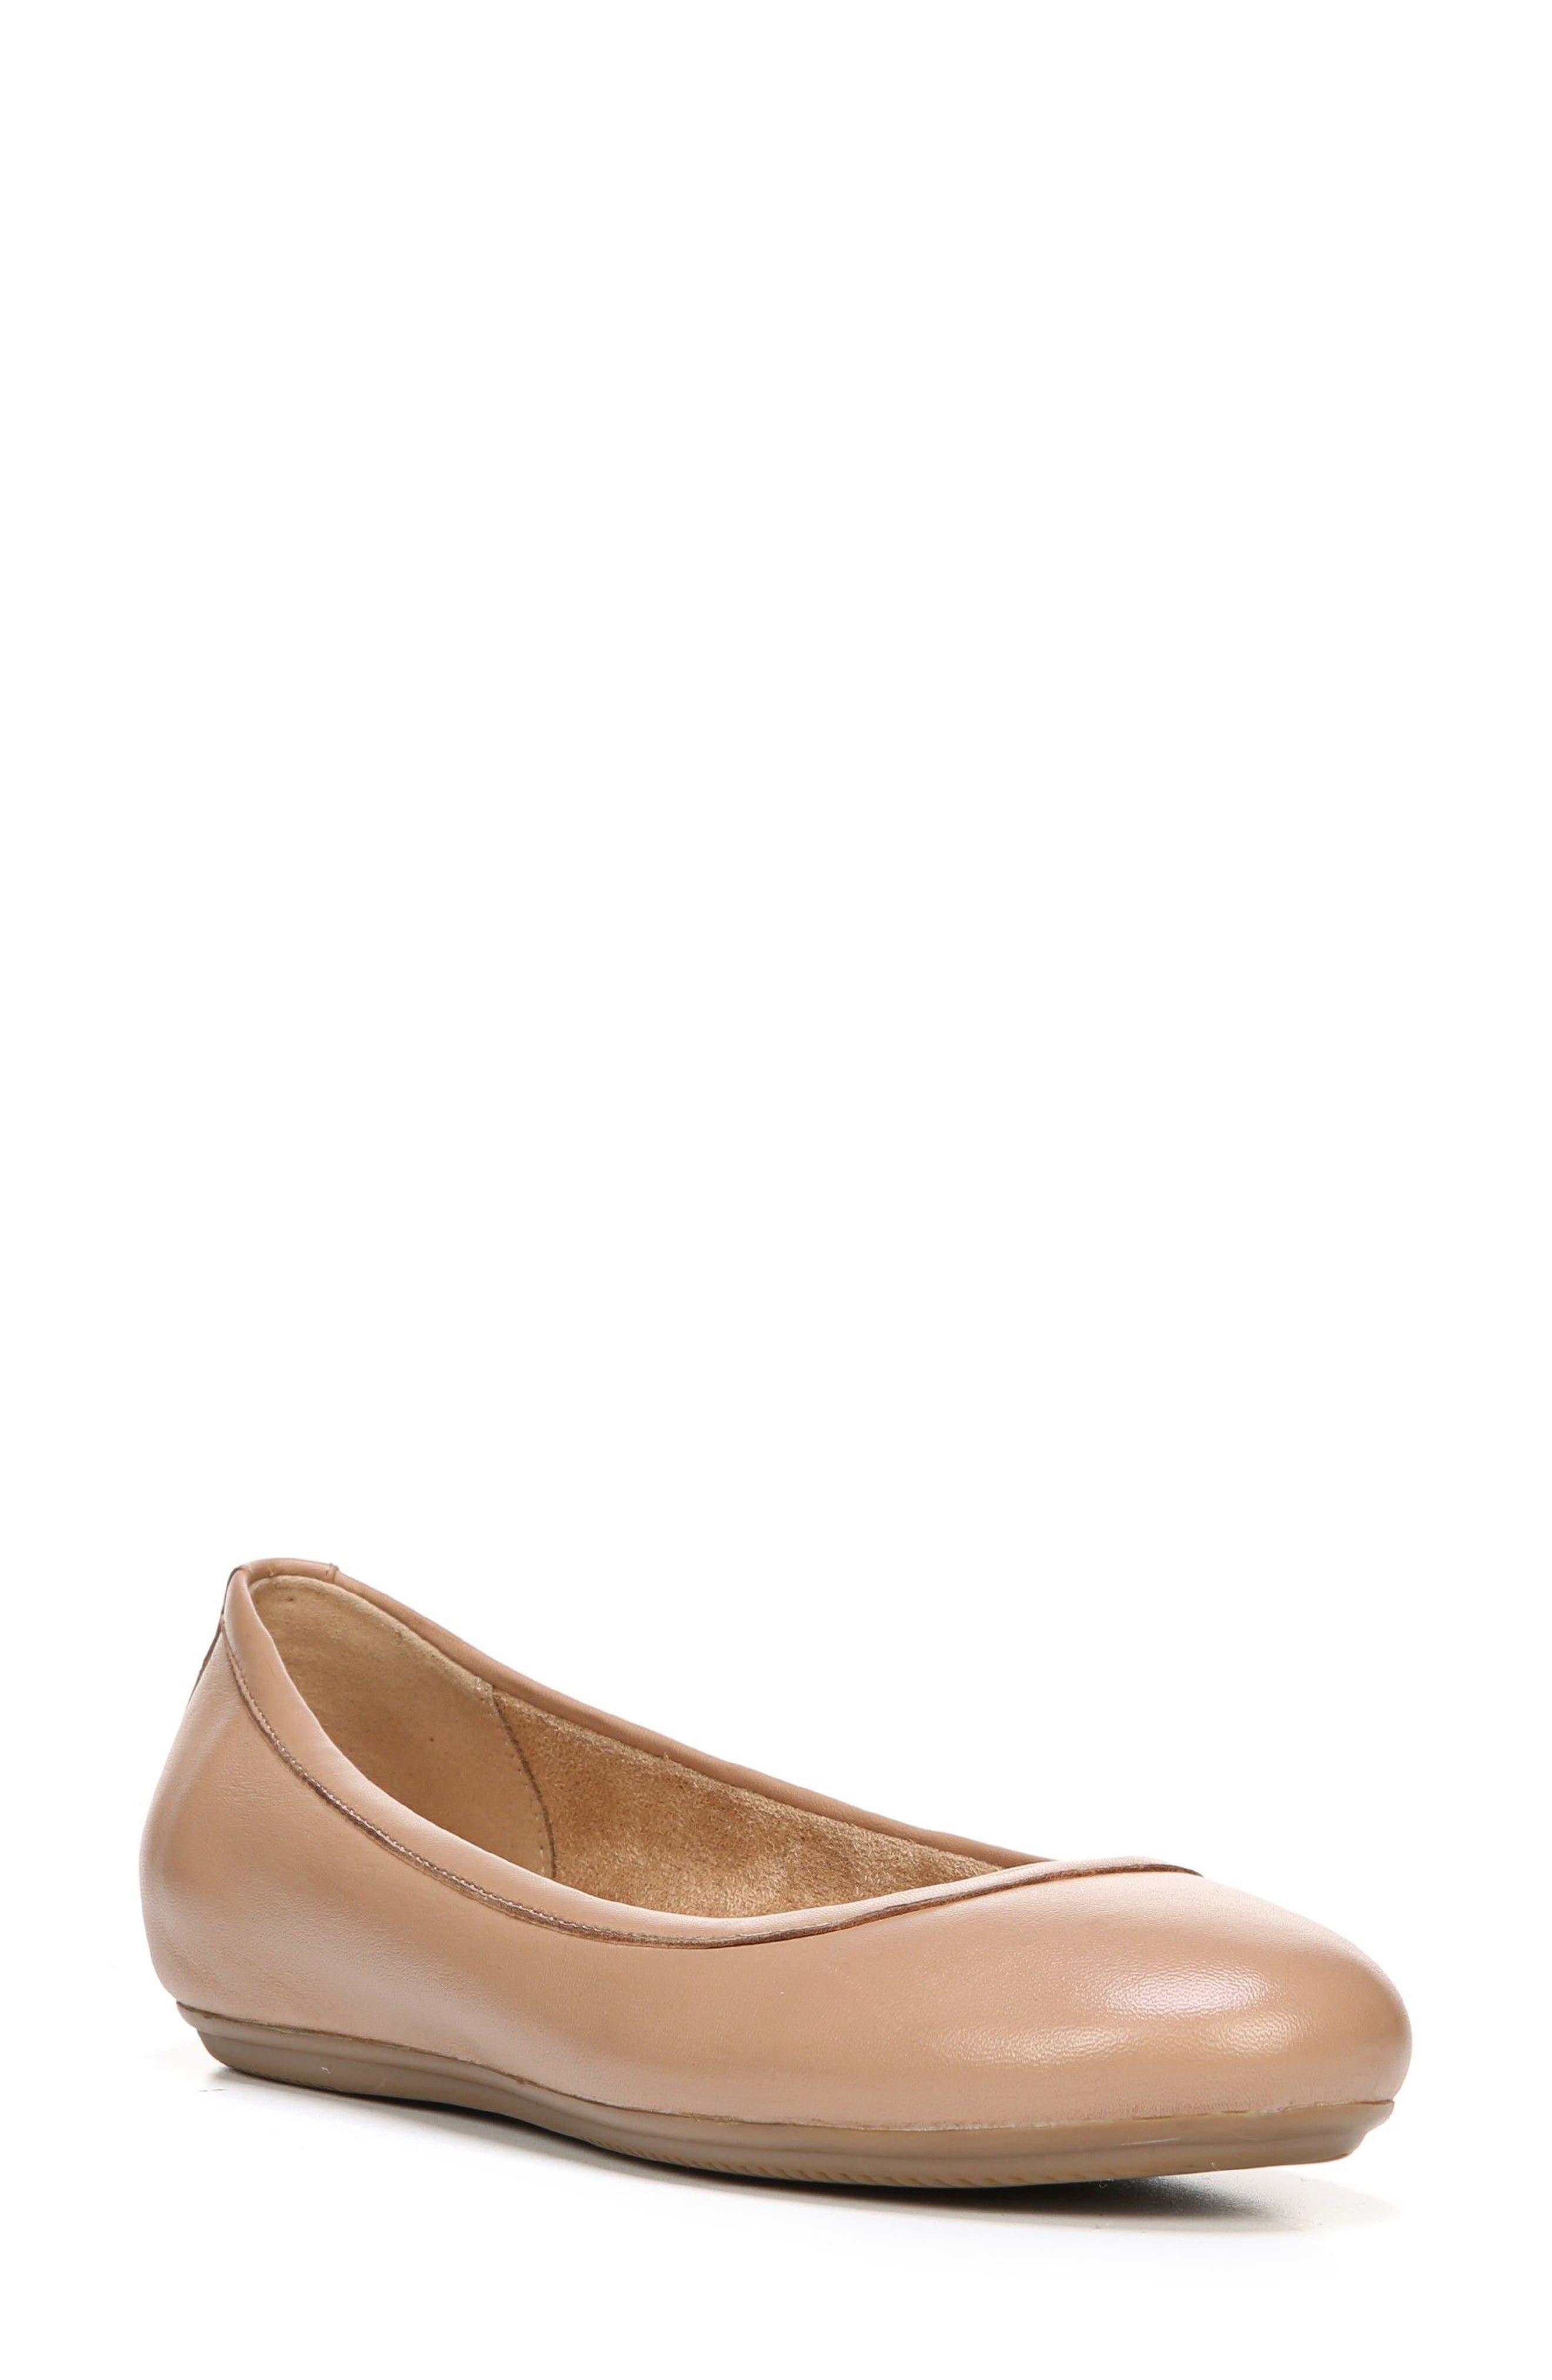 Naturalizer Brittany Ballet Flat (Women)